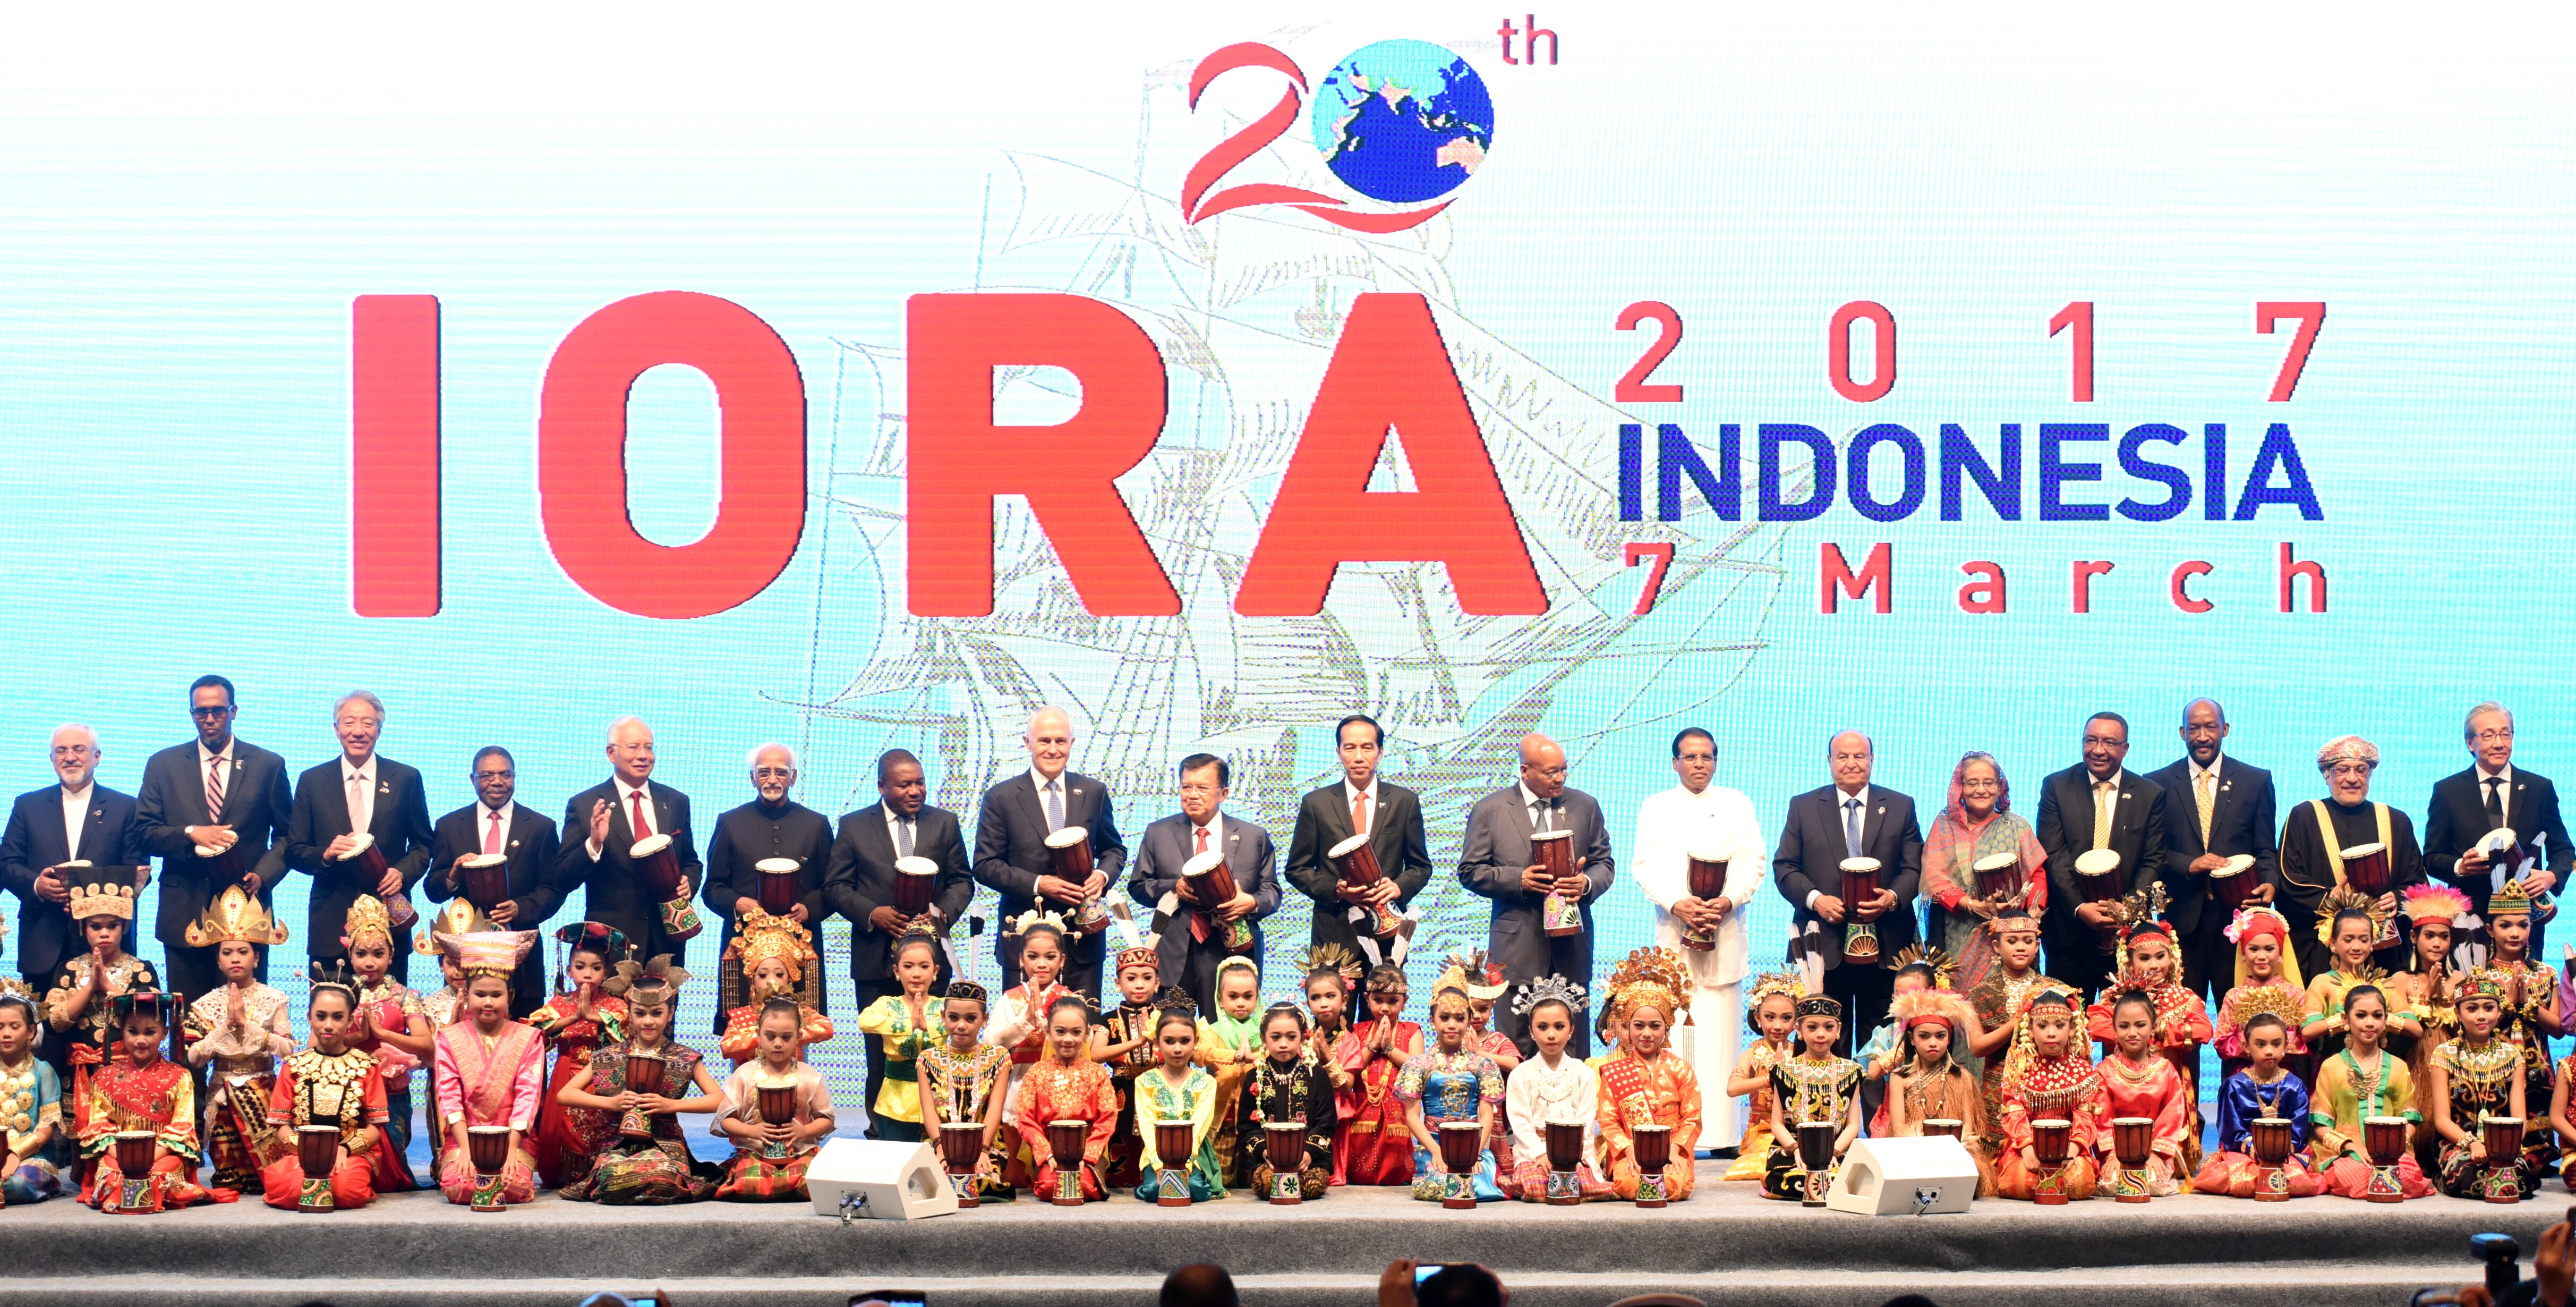 Presiden Jokowi dan Wakil Presiden Jusuf Kalla membawa tifa yang akan dipukul sebagai tanda pembukaan KTT IORA, di JCC Jakarta, Selasa (7/3) pagi. (Foto: Rahmat/Humas)